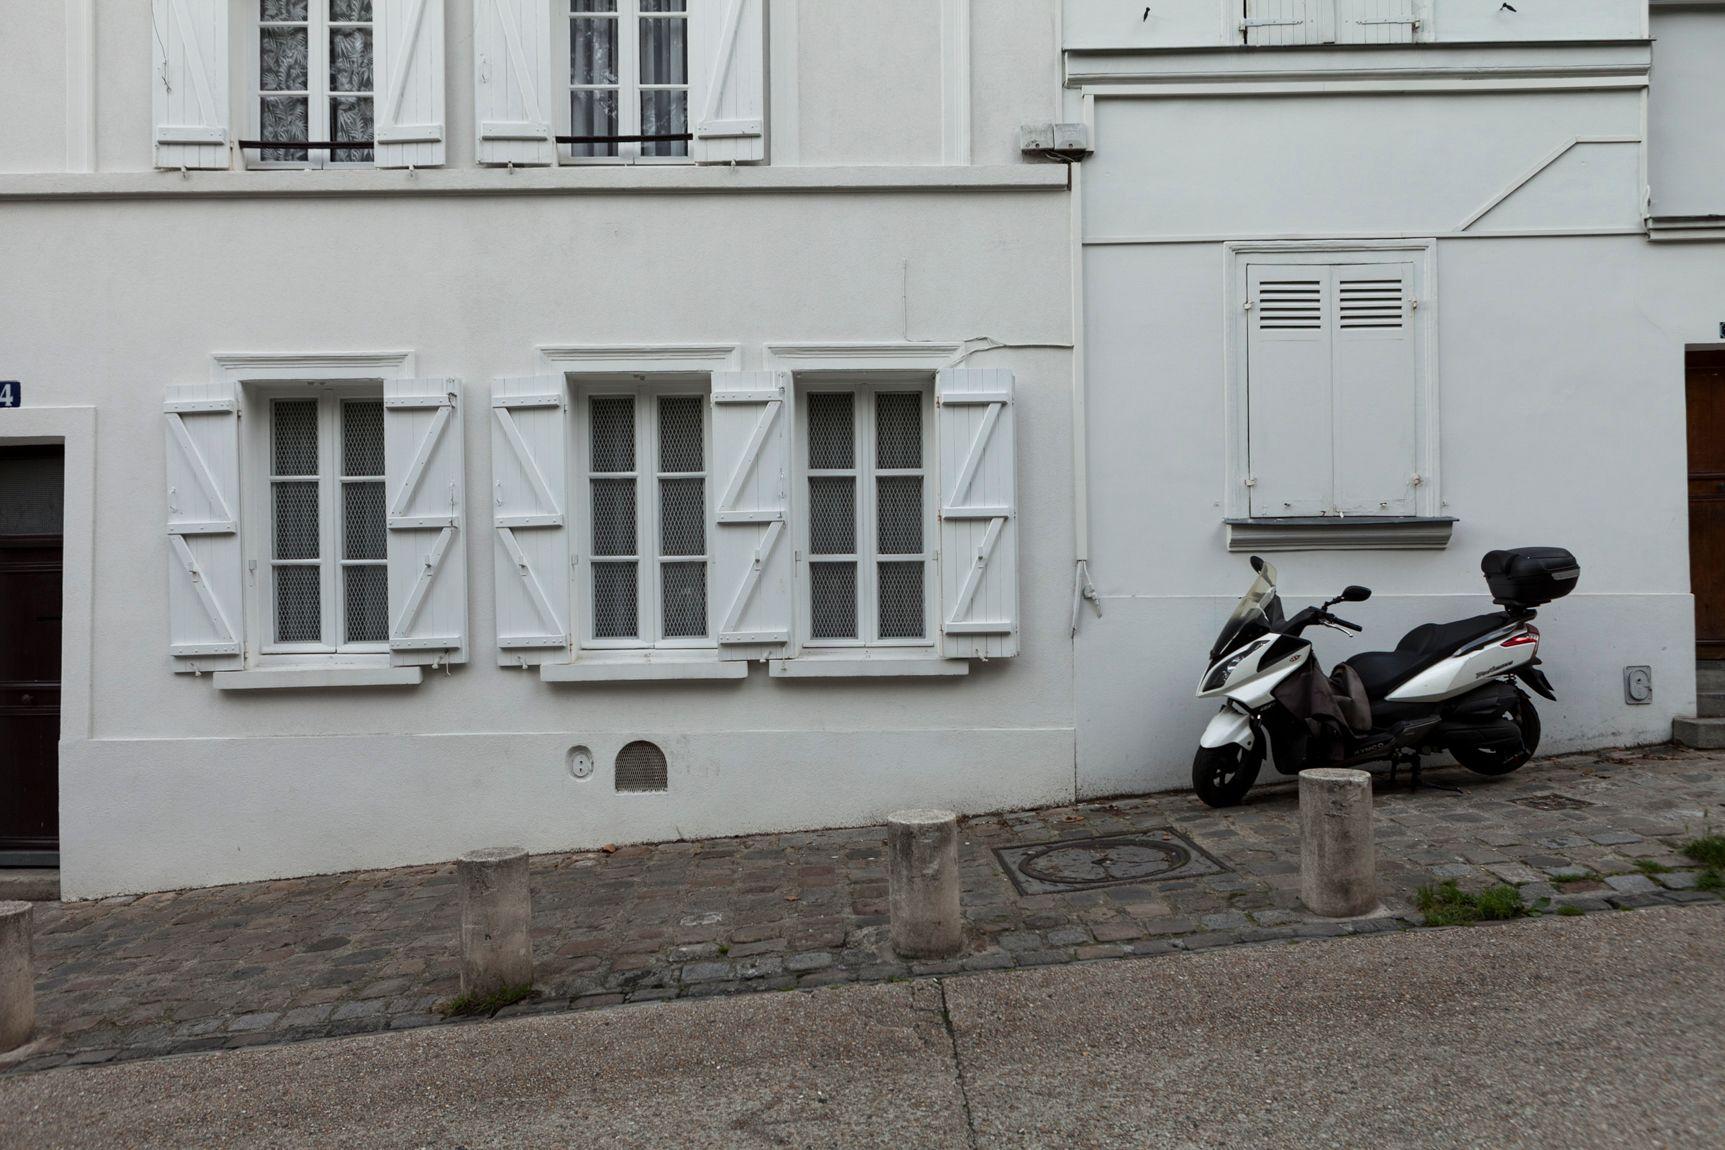 Paris2016PaoloPhoto-8849.jpg